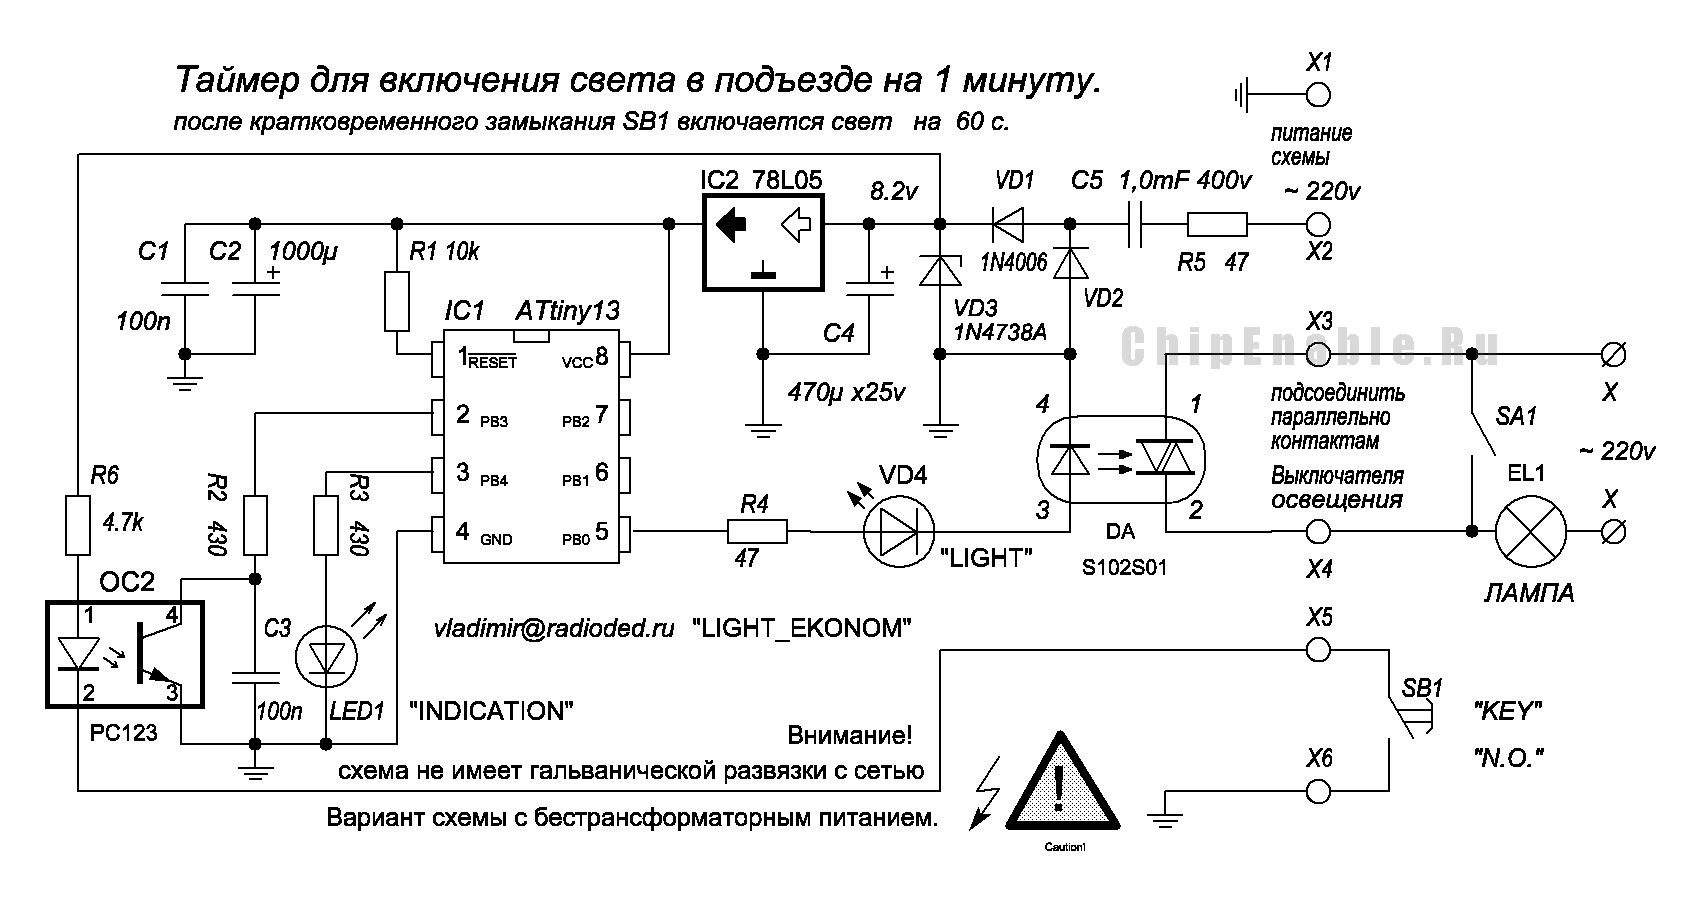 Фрл 01 схема подключения